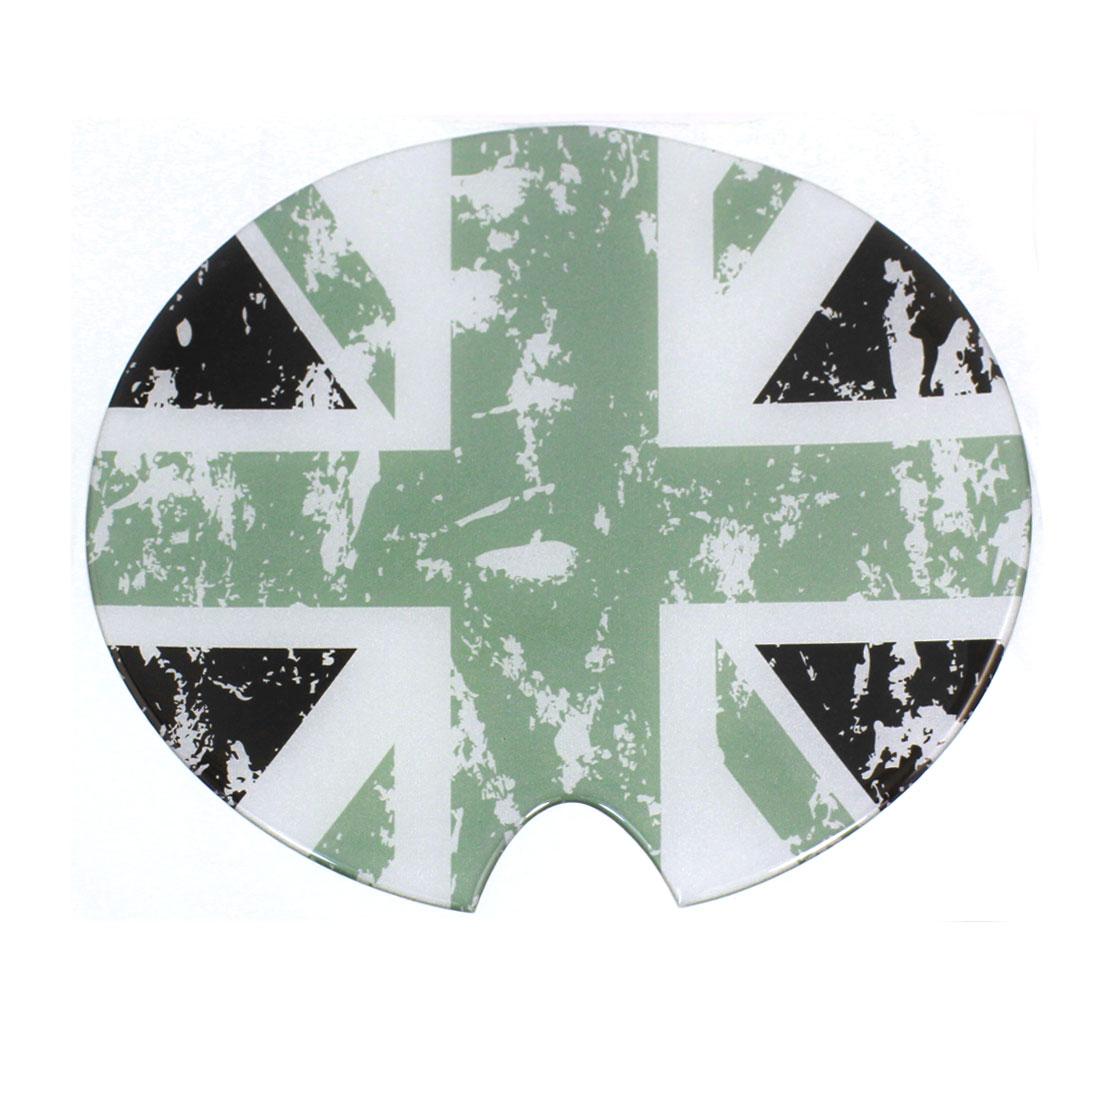 16cm Dia Round Flag Pattern Emblem Badge Decorative Sticker for Auto Car